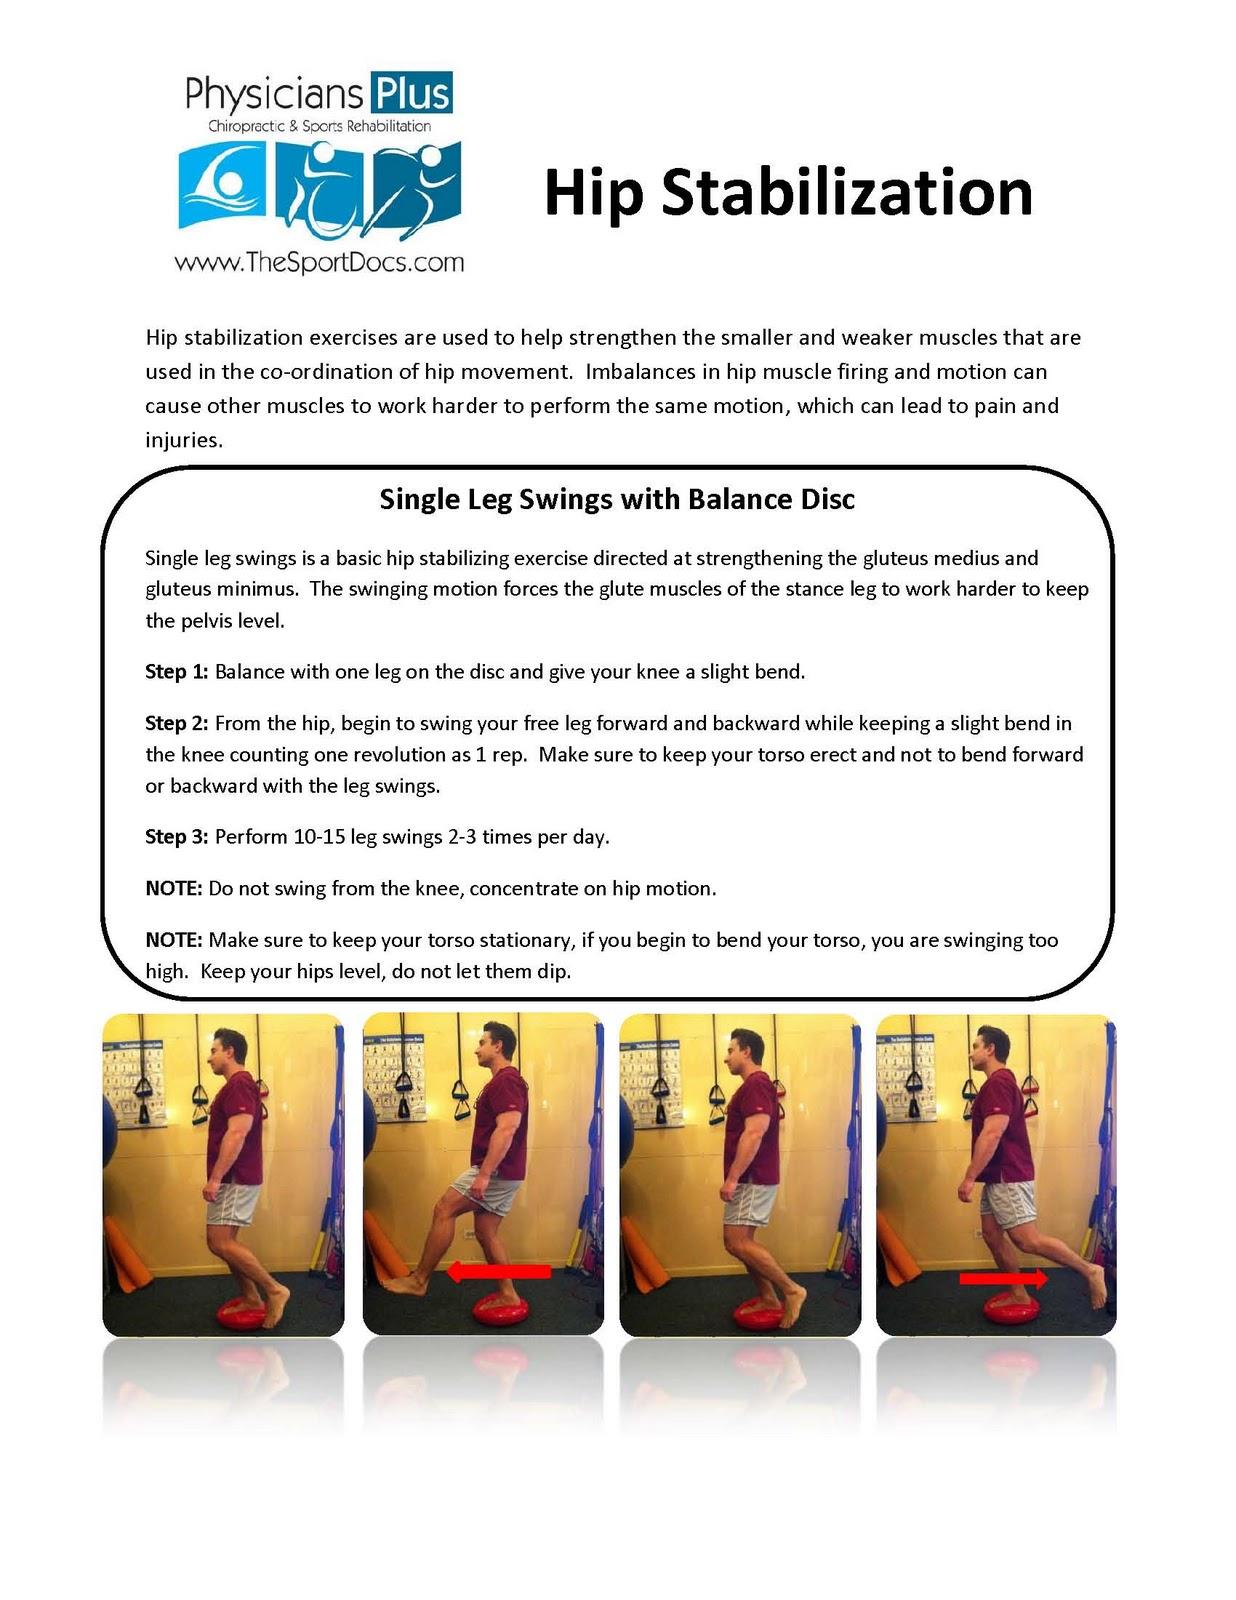 ... Sports Rehab: Physicians Plus Chicago - Hip Stabilization Exercises